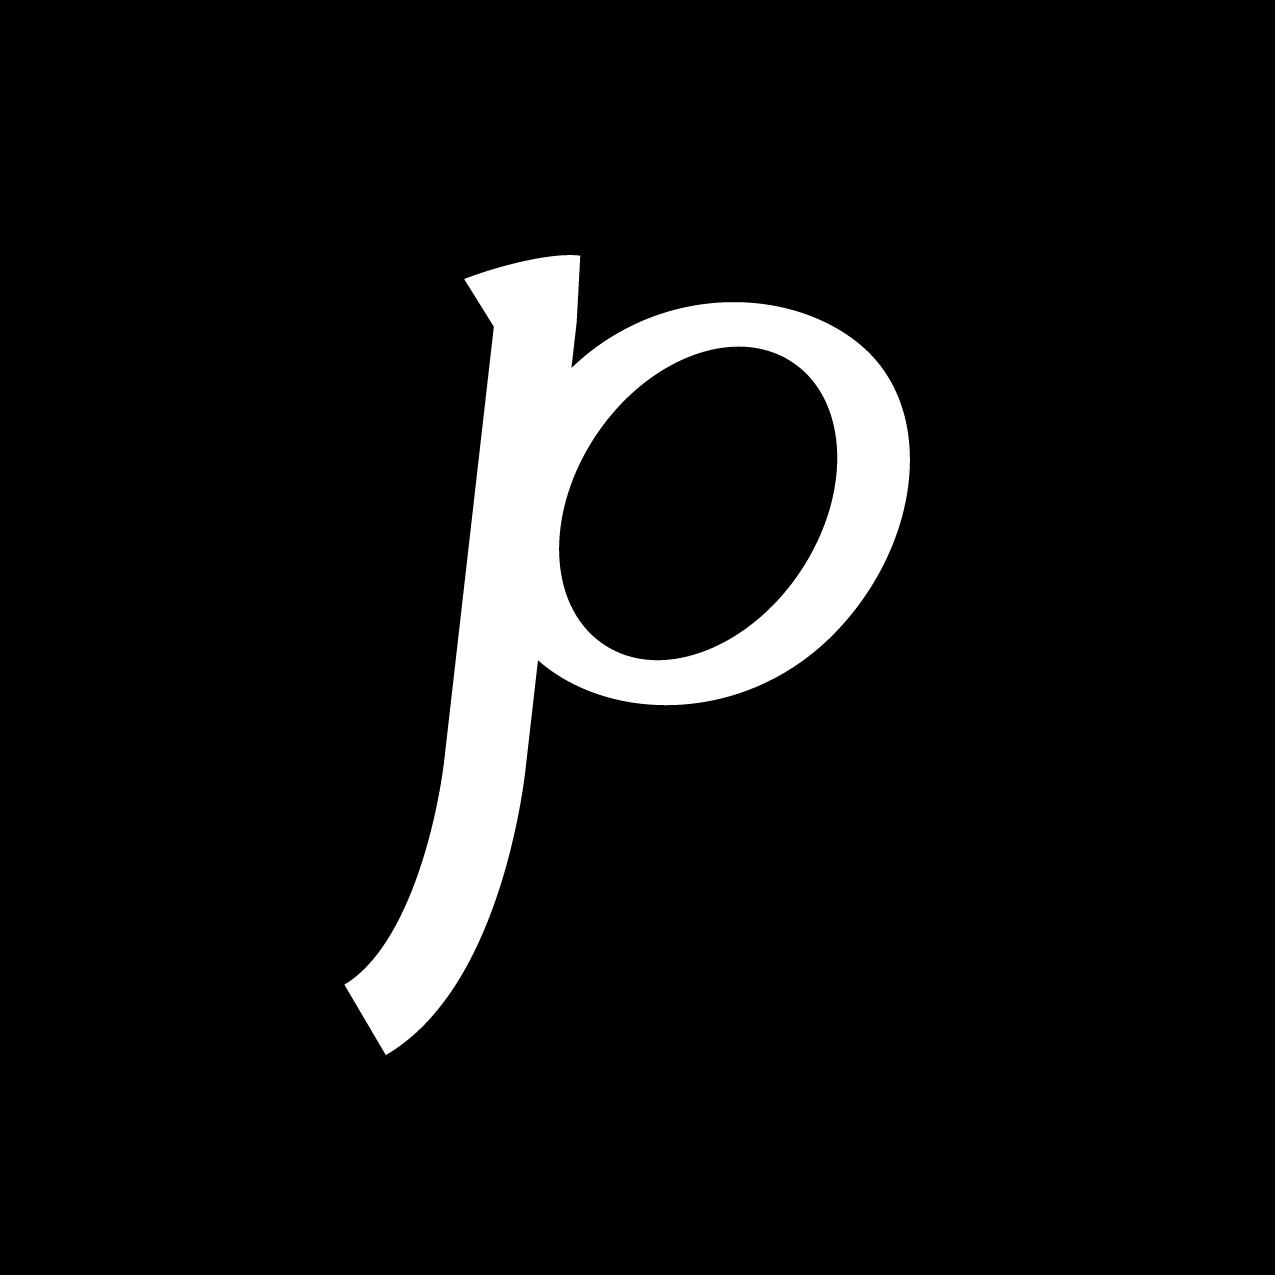 Letter P6 Design by Furia